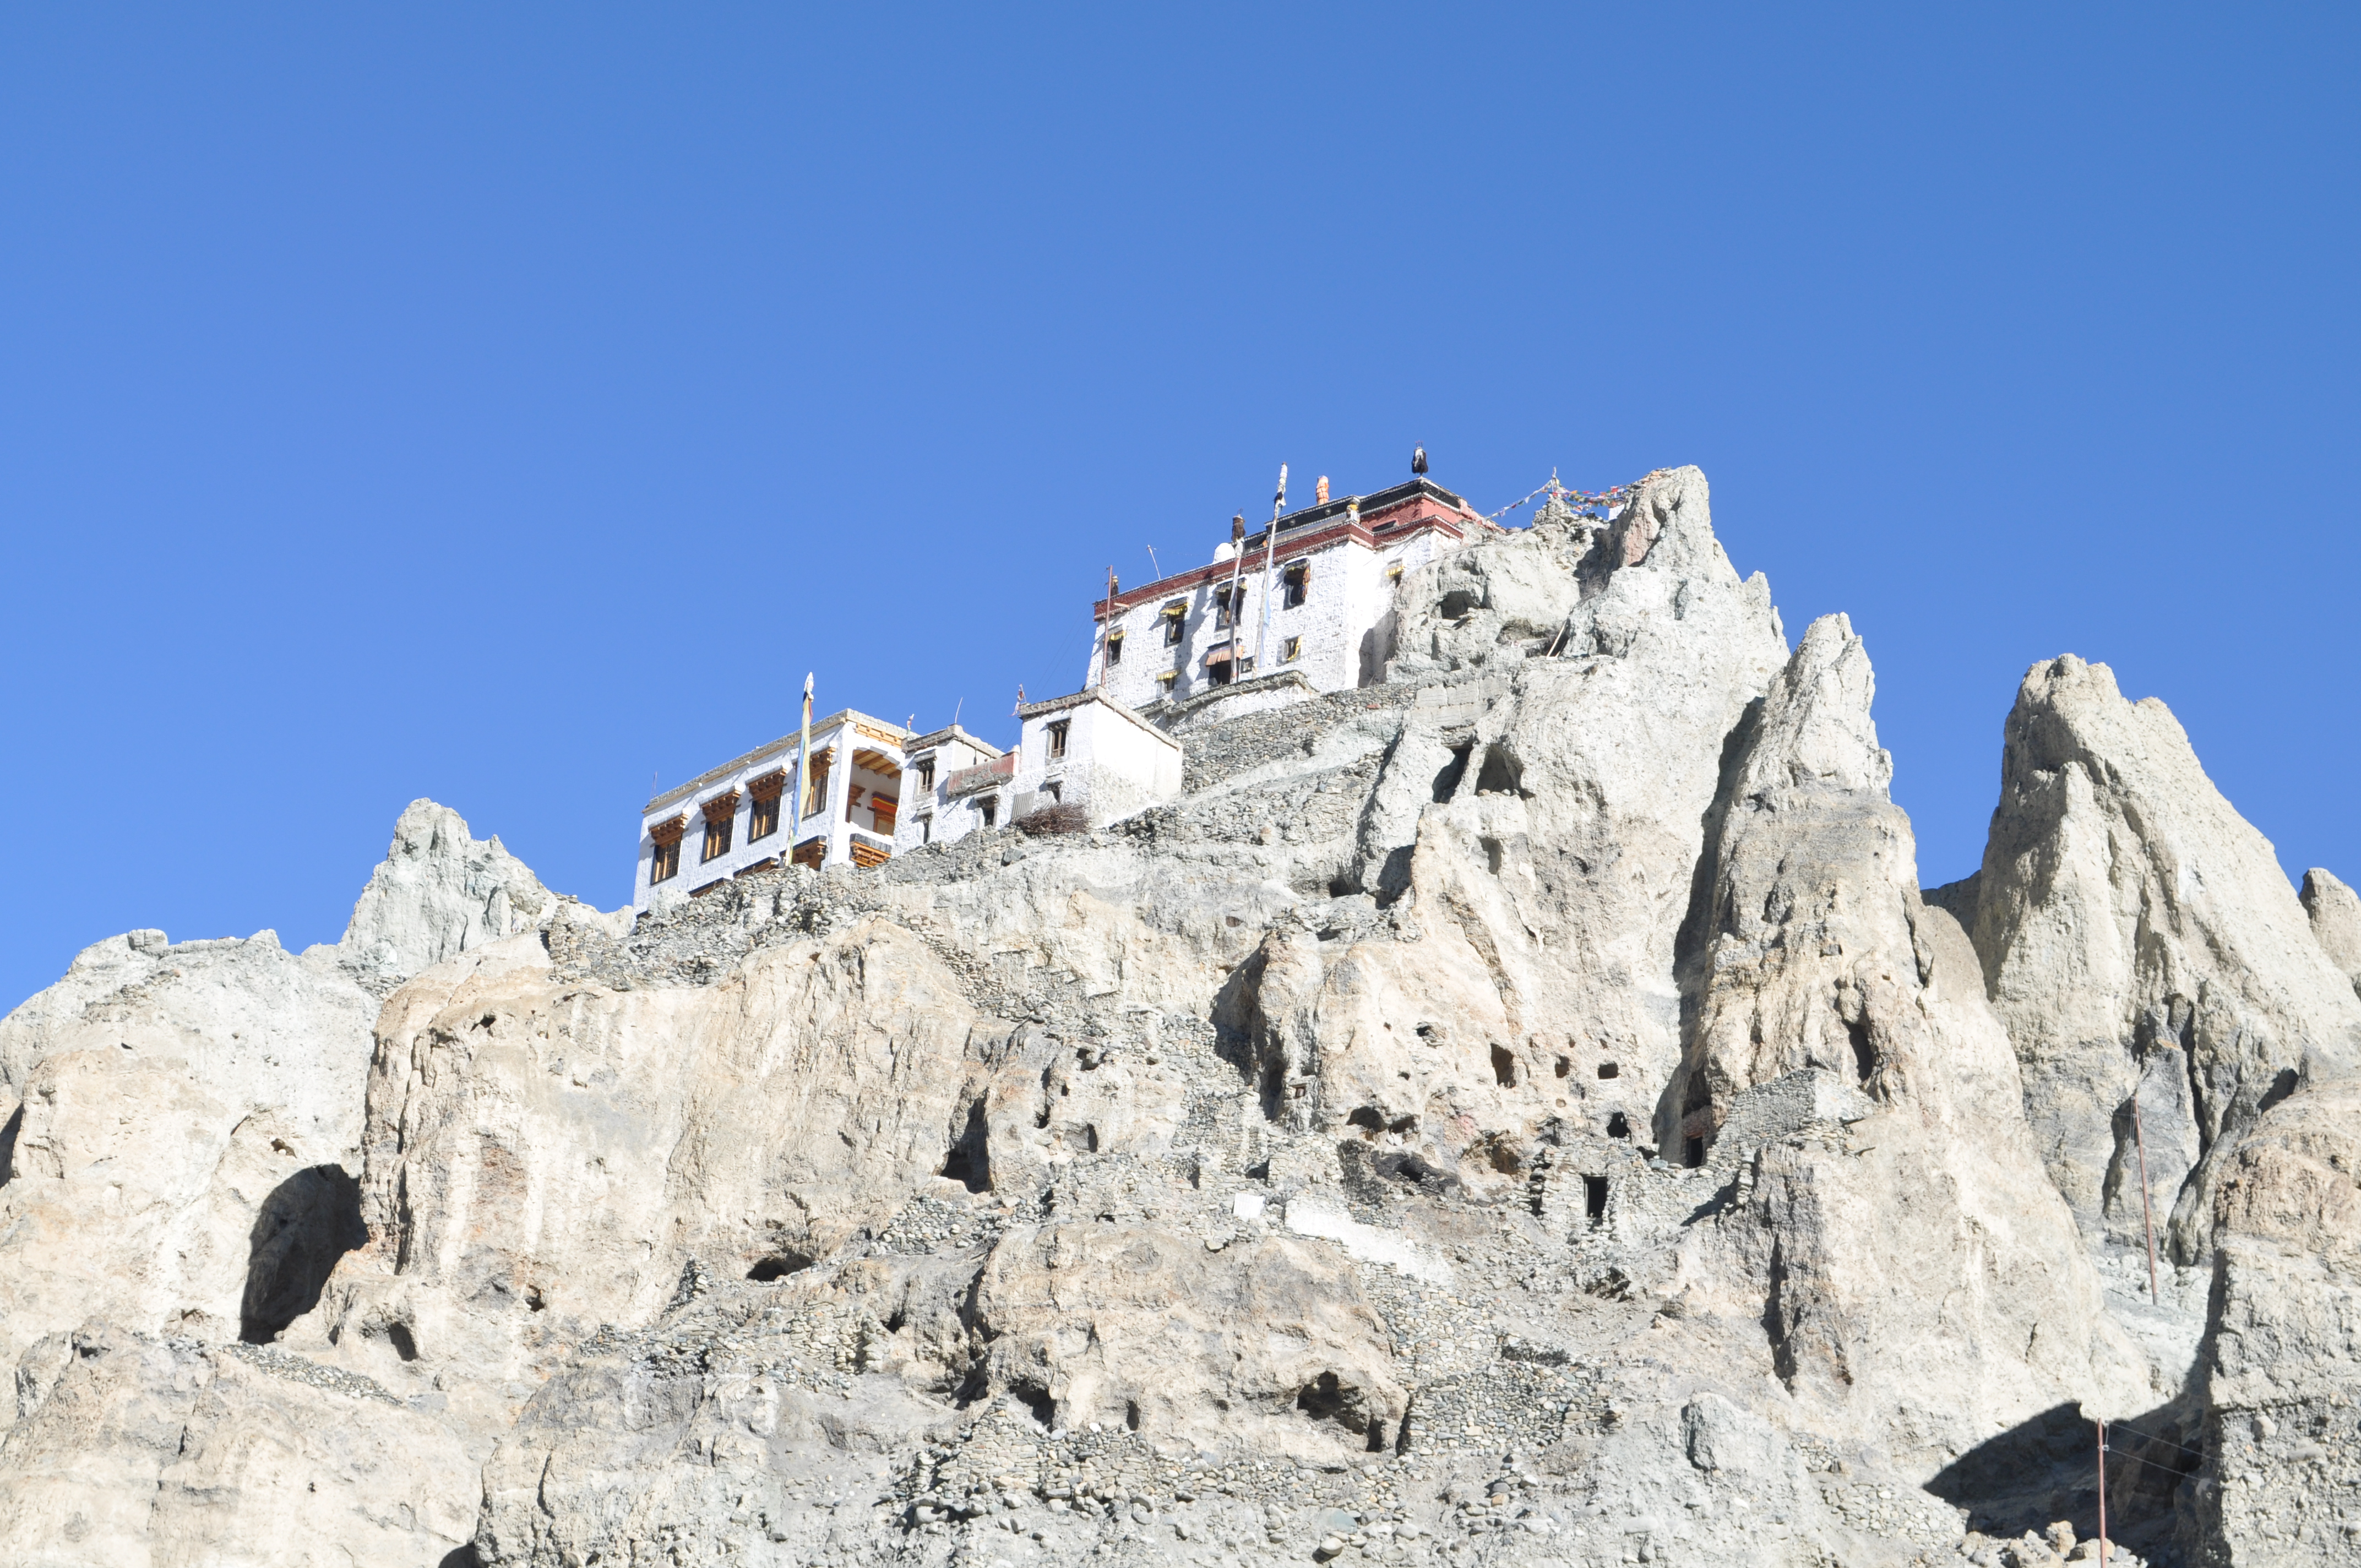 Tangyar Village